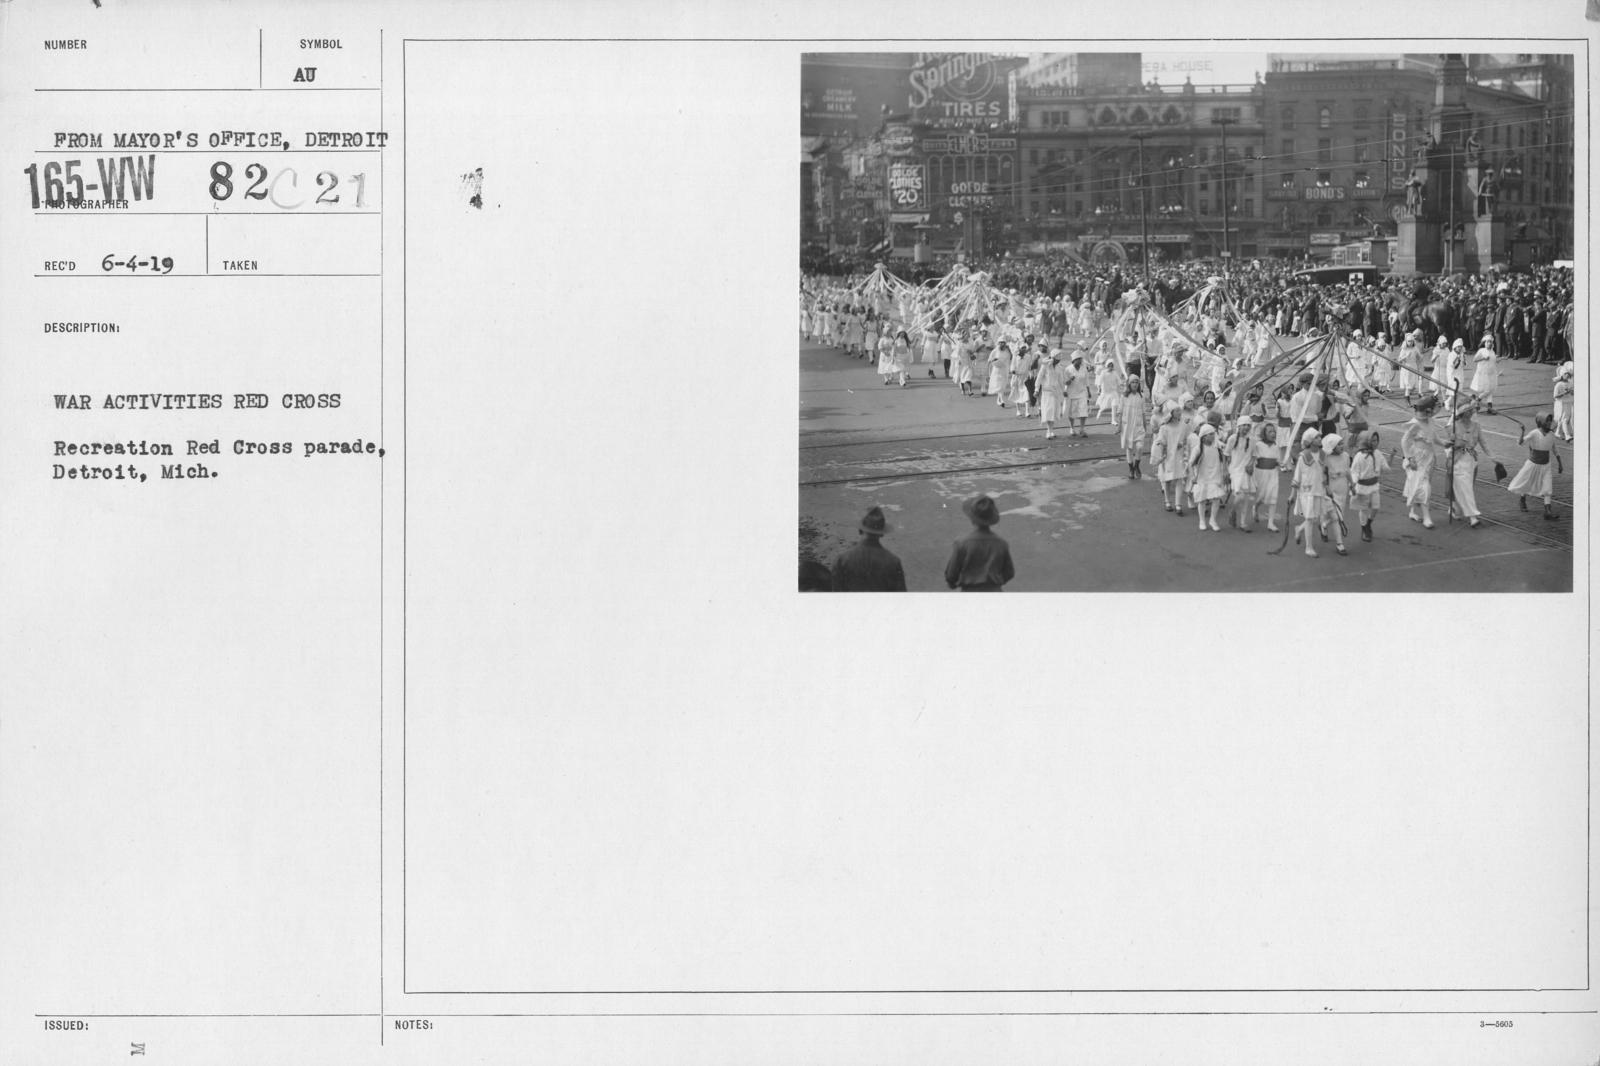 Ceremonies - Michigan thru New Jersey - War activities Red Cross. Recreation Red Cross parade, Detroit, Mich